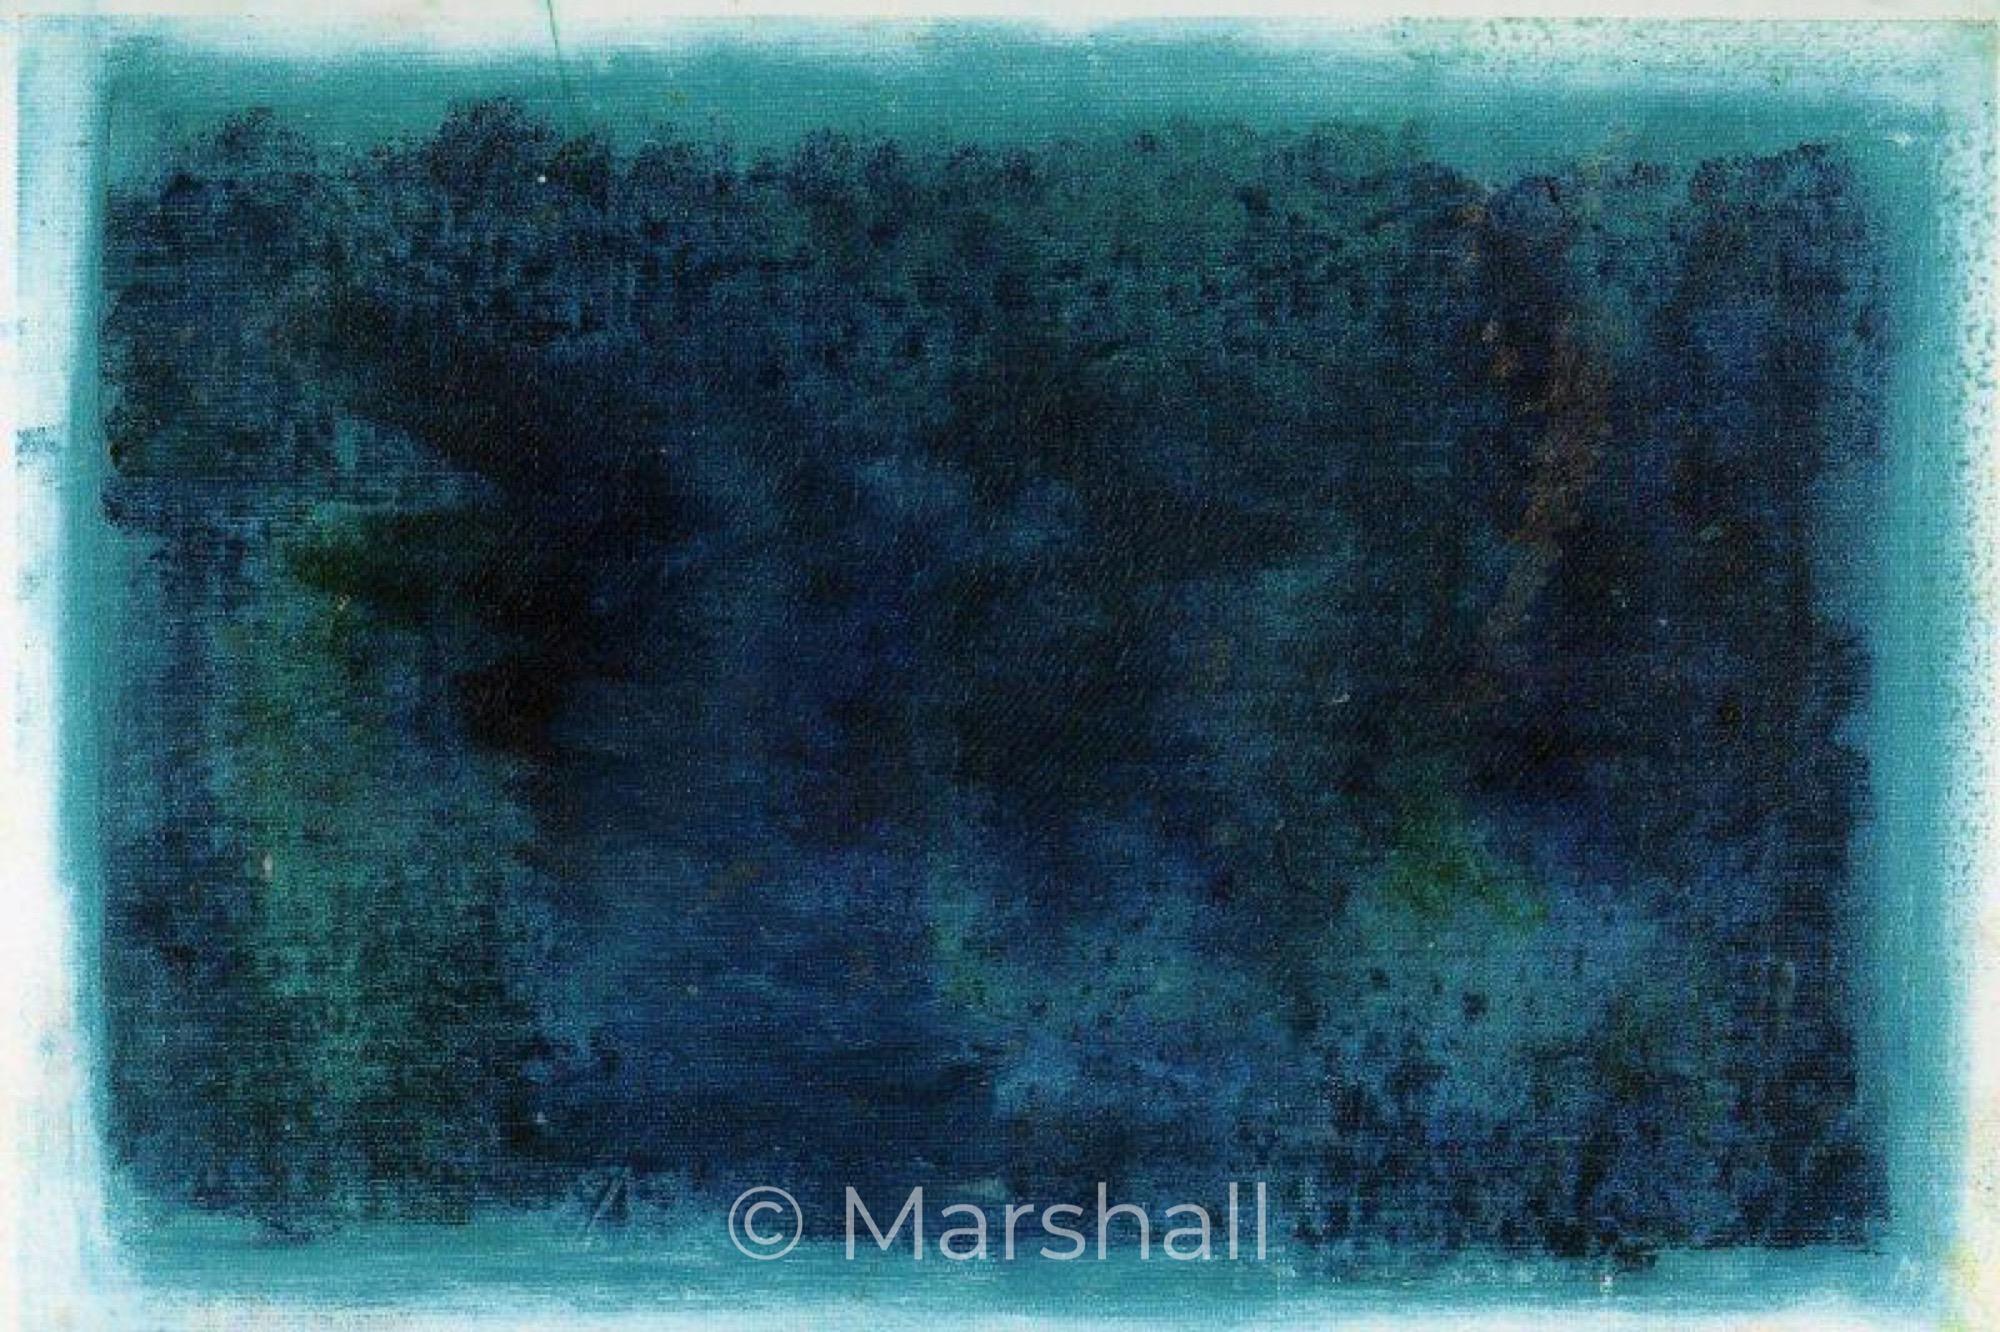 Marshall_turquoise